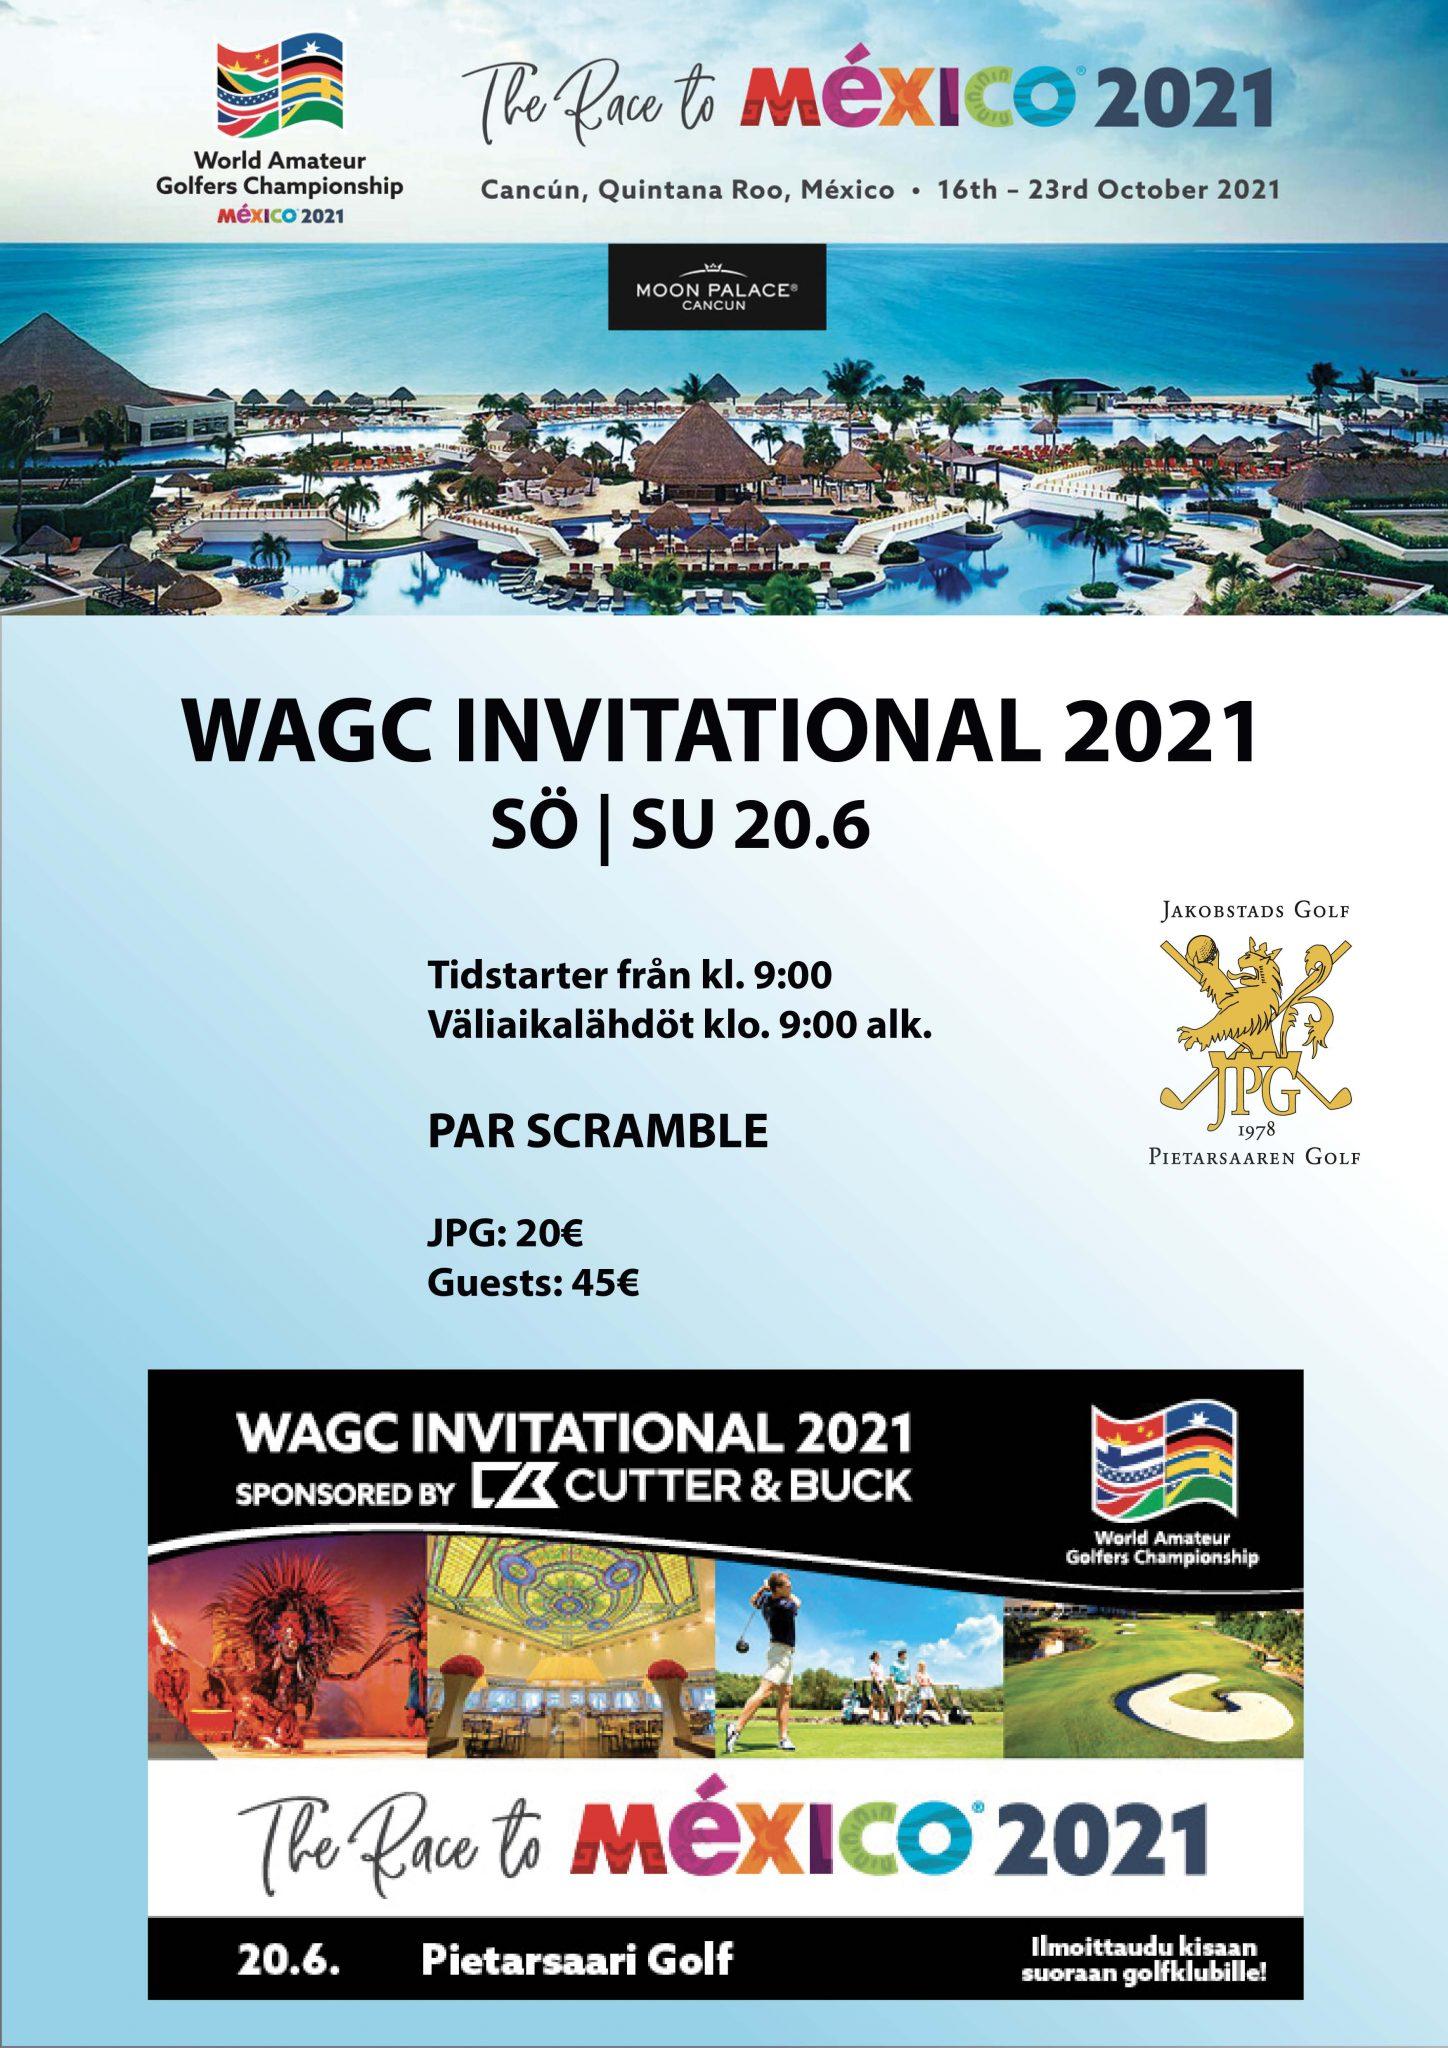 WAGC INVITATIONAL 2021 – SCRAMBLE